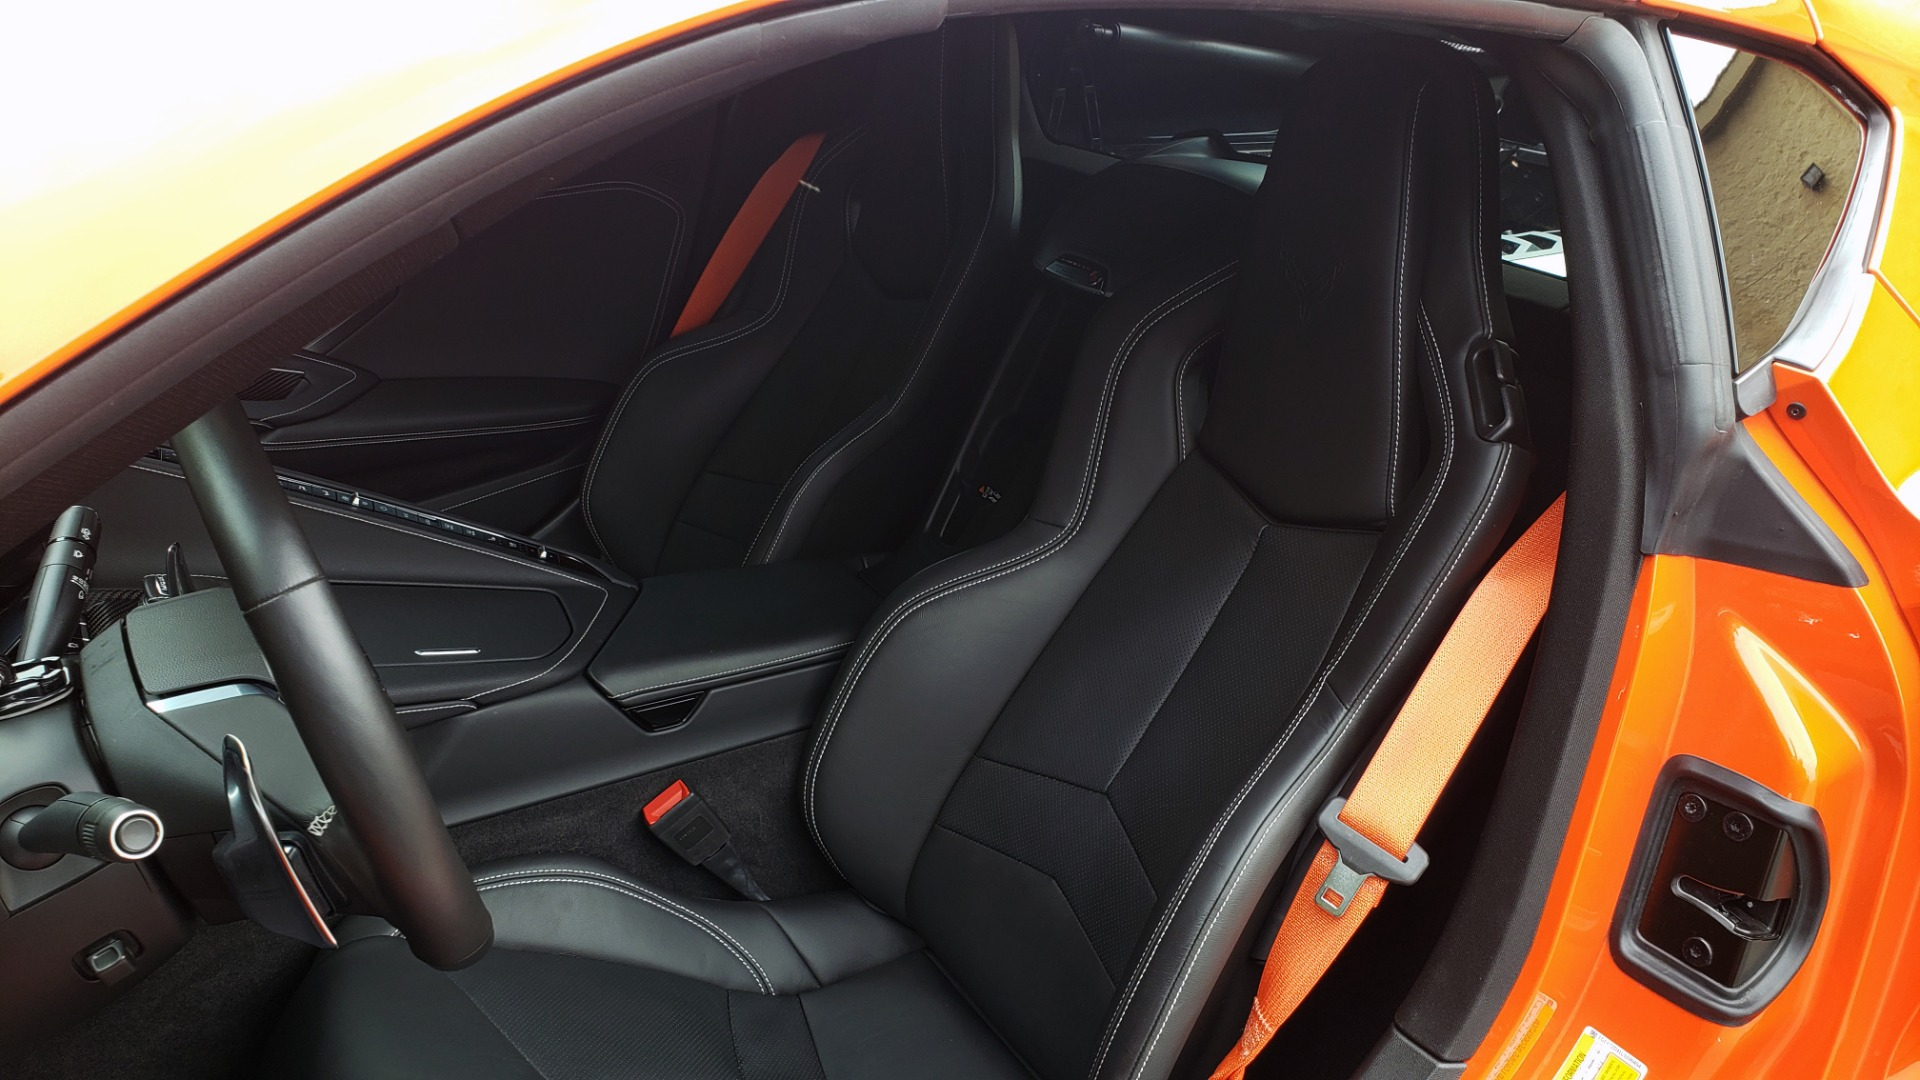 Used 2020 Chevrolet CORVETTE C8 STINGRAY 2LT / 6.2L V8 / 8-SPD AUTO / NAV / BOSE / REARVIEW / DATA RECOR for sale Sold at Formula Imports in Charlotte NC 28227 40